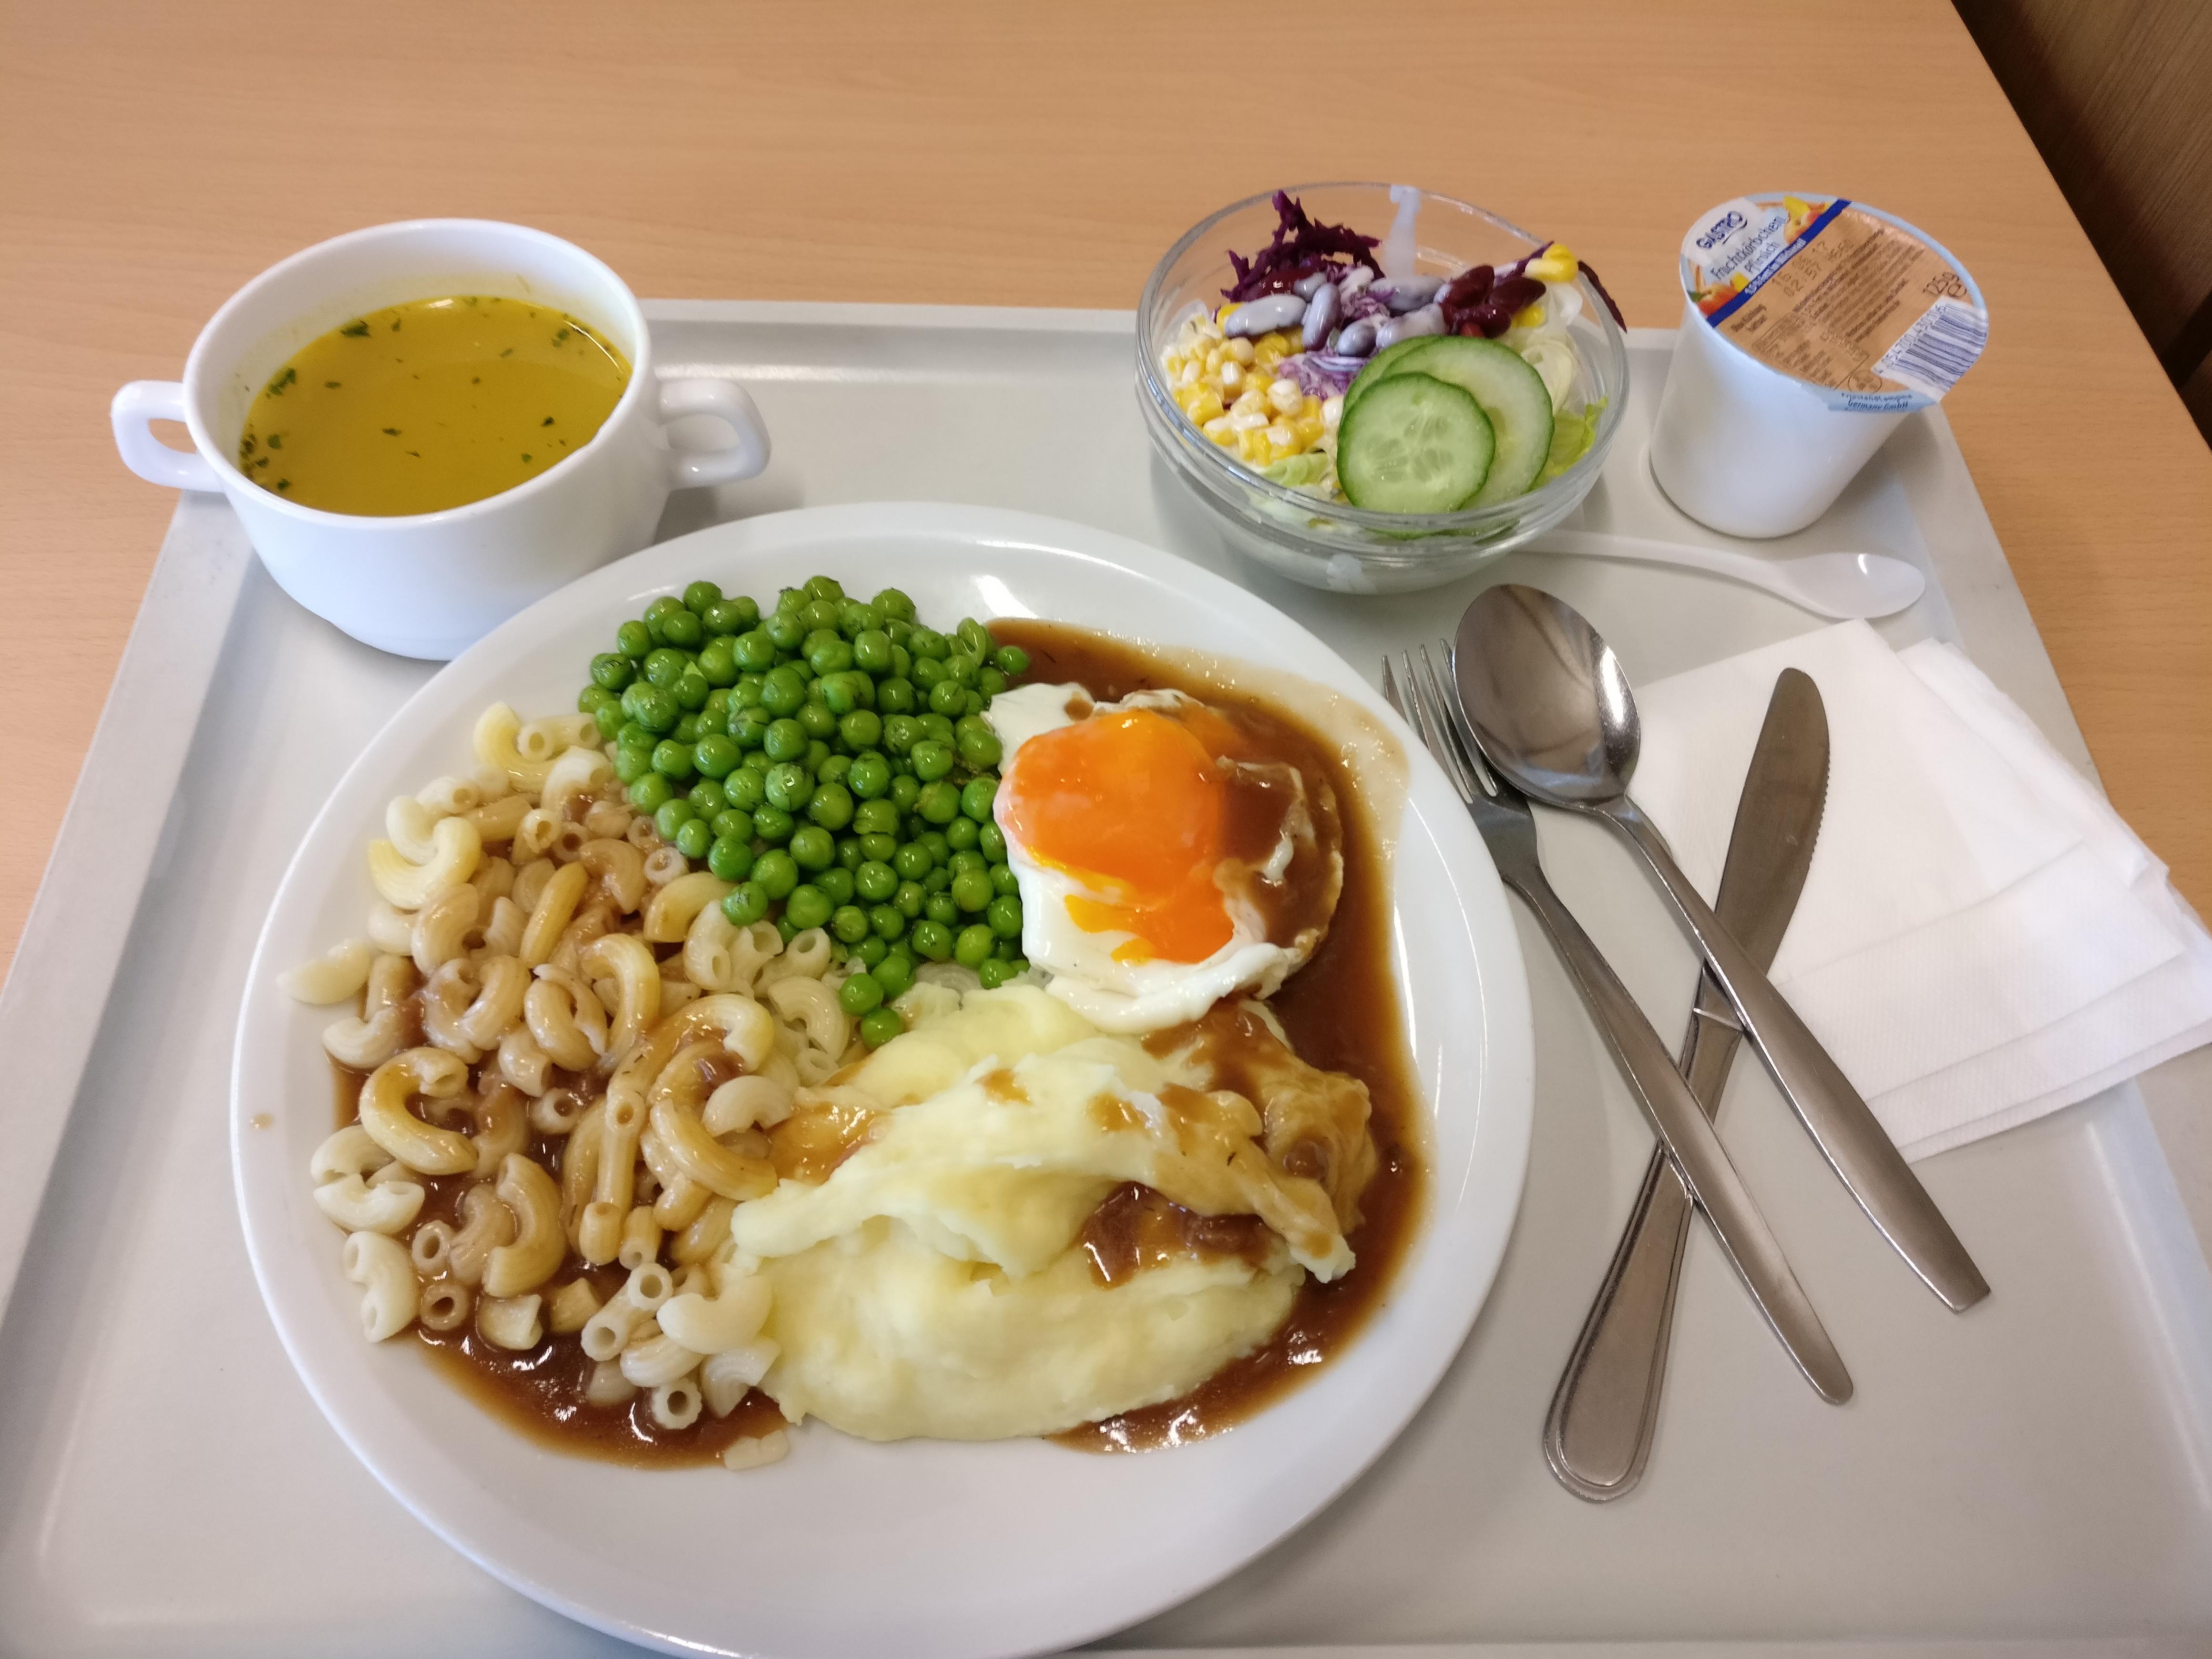 http://foodloader.net/nico_2017-05-16_spiegelei-erbsen-kartoffelpuree-nudeln-suppe-salat-joghurt.jpg